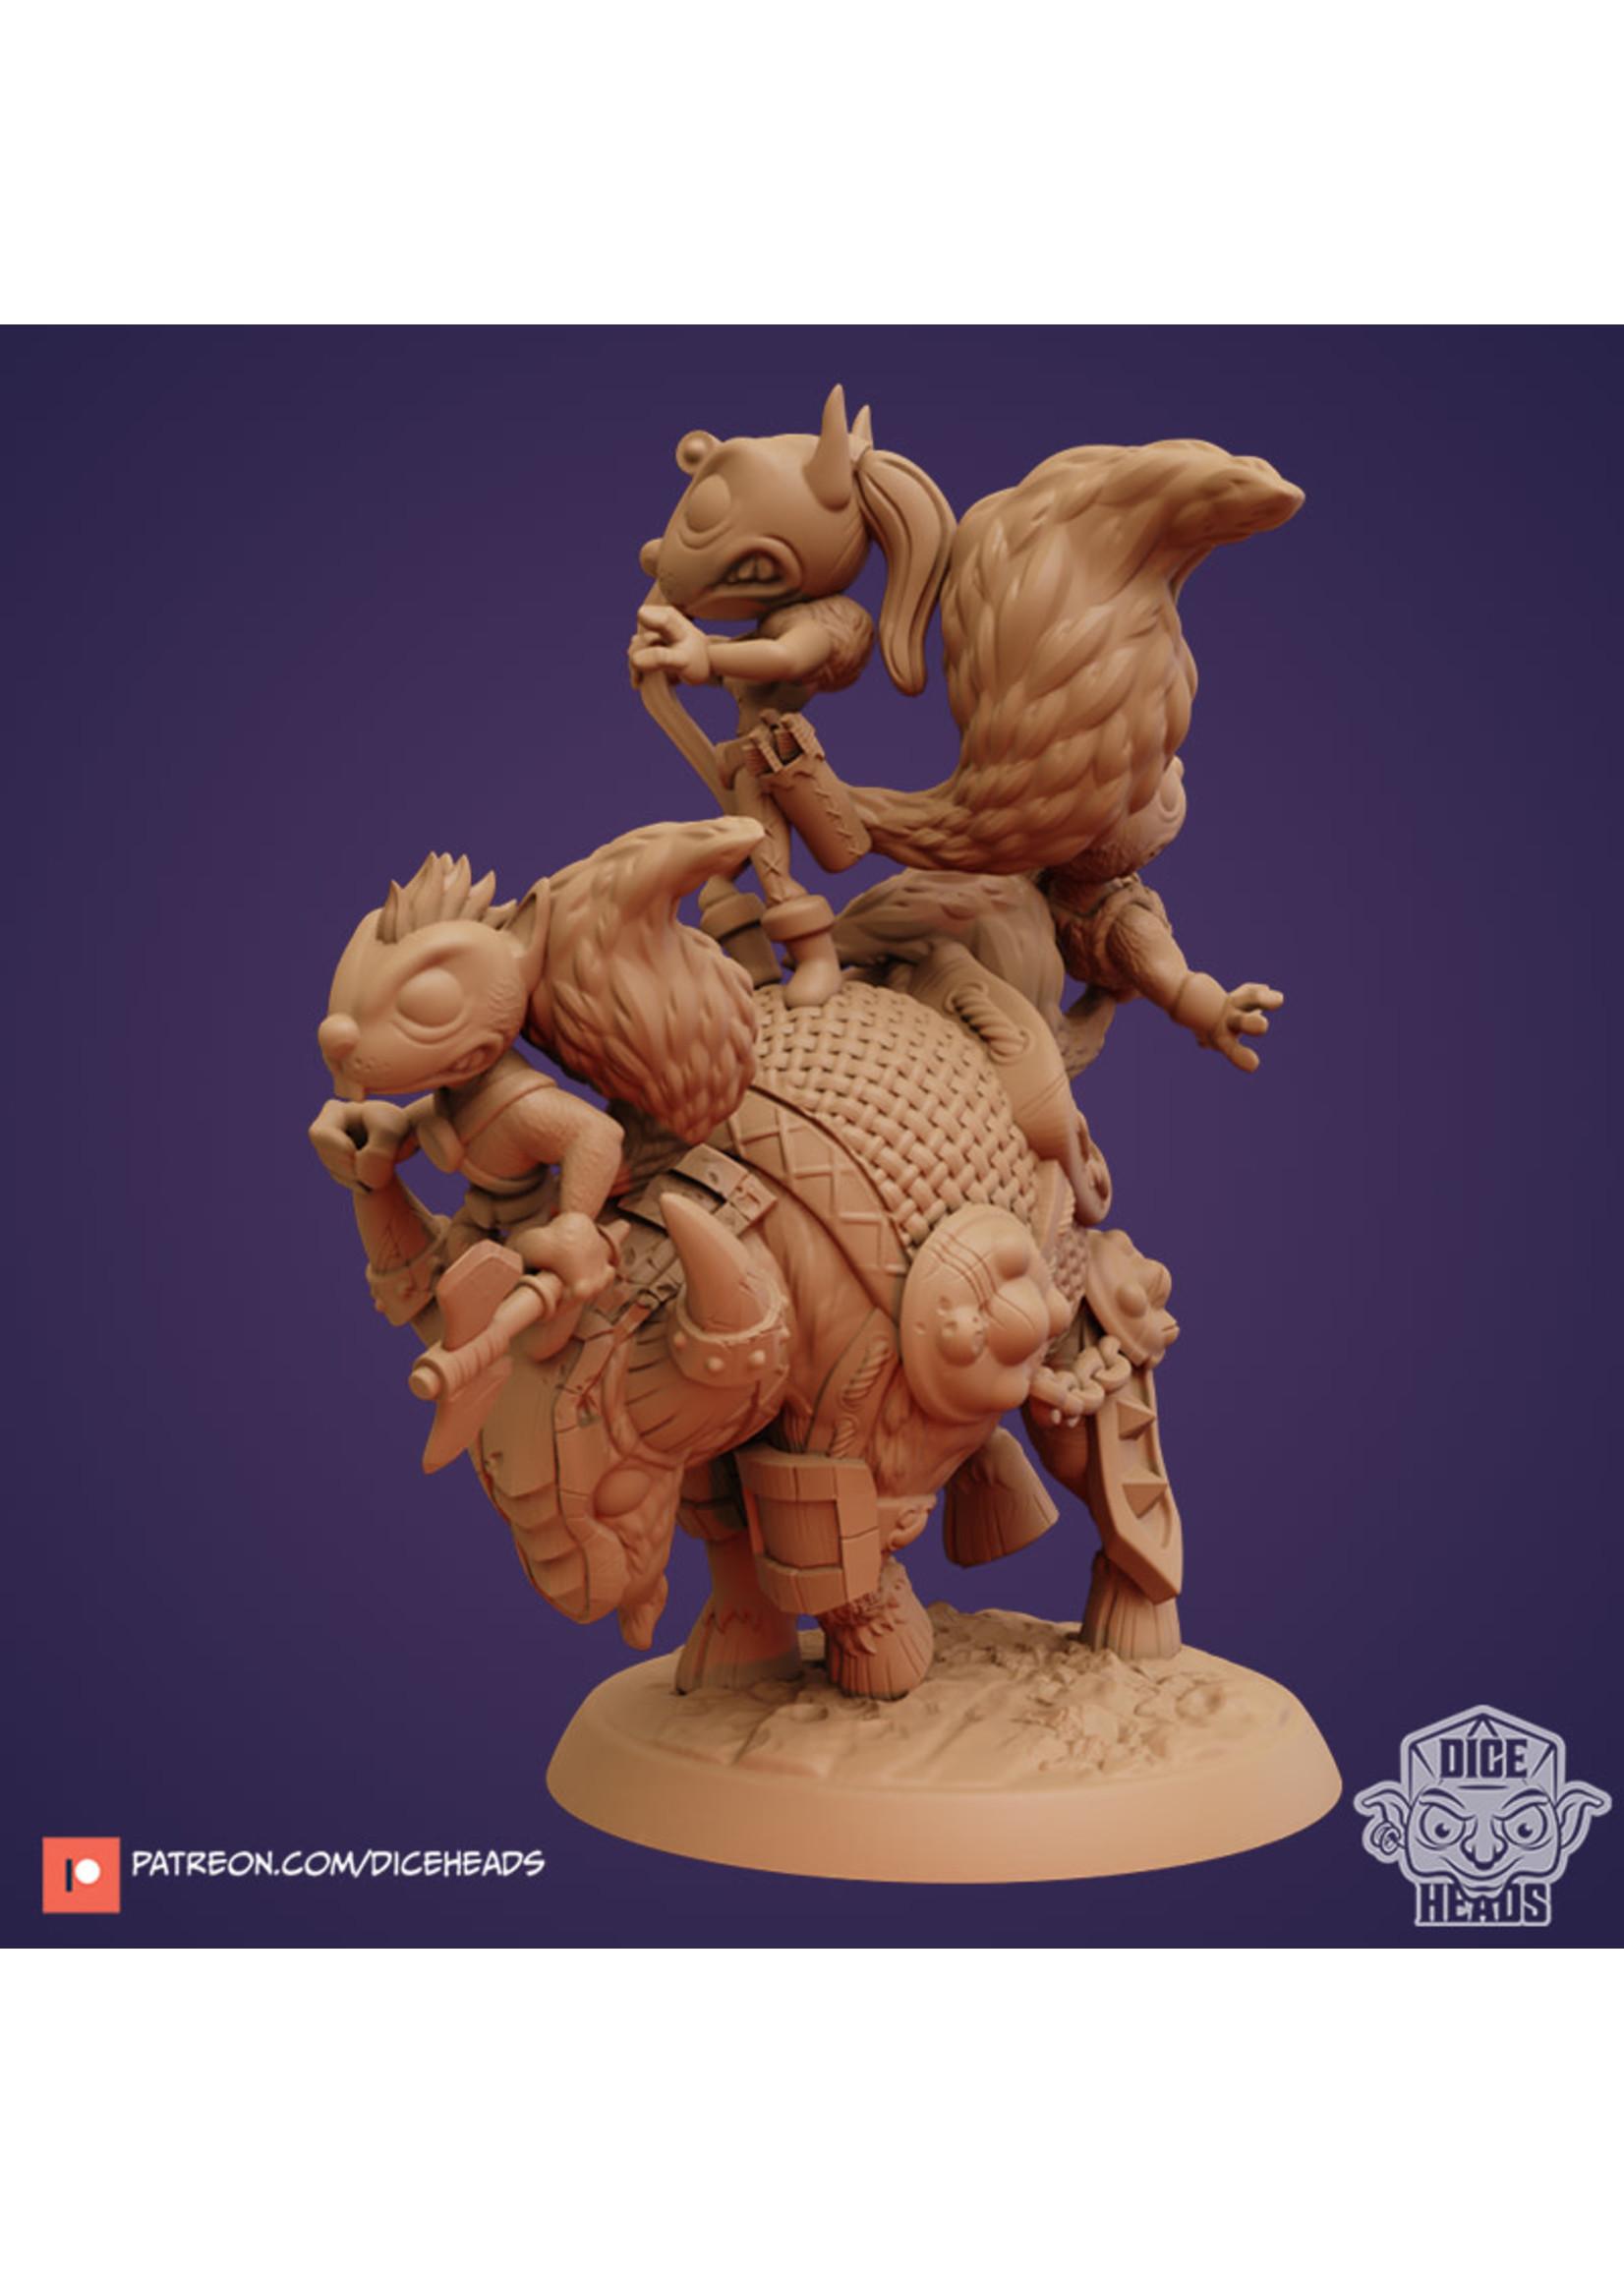 3D Printed Miniature - Bull Mount - Dungeons & Dragons - Zoontalis KS